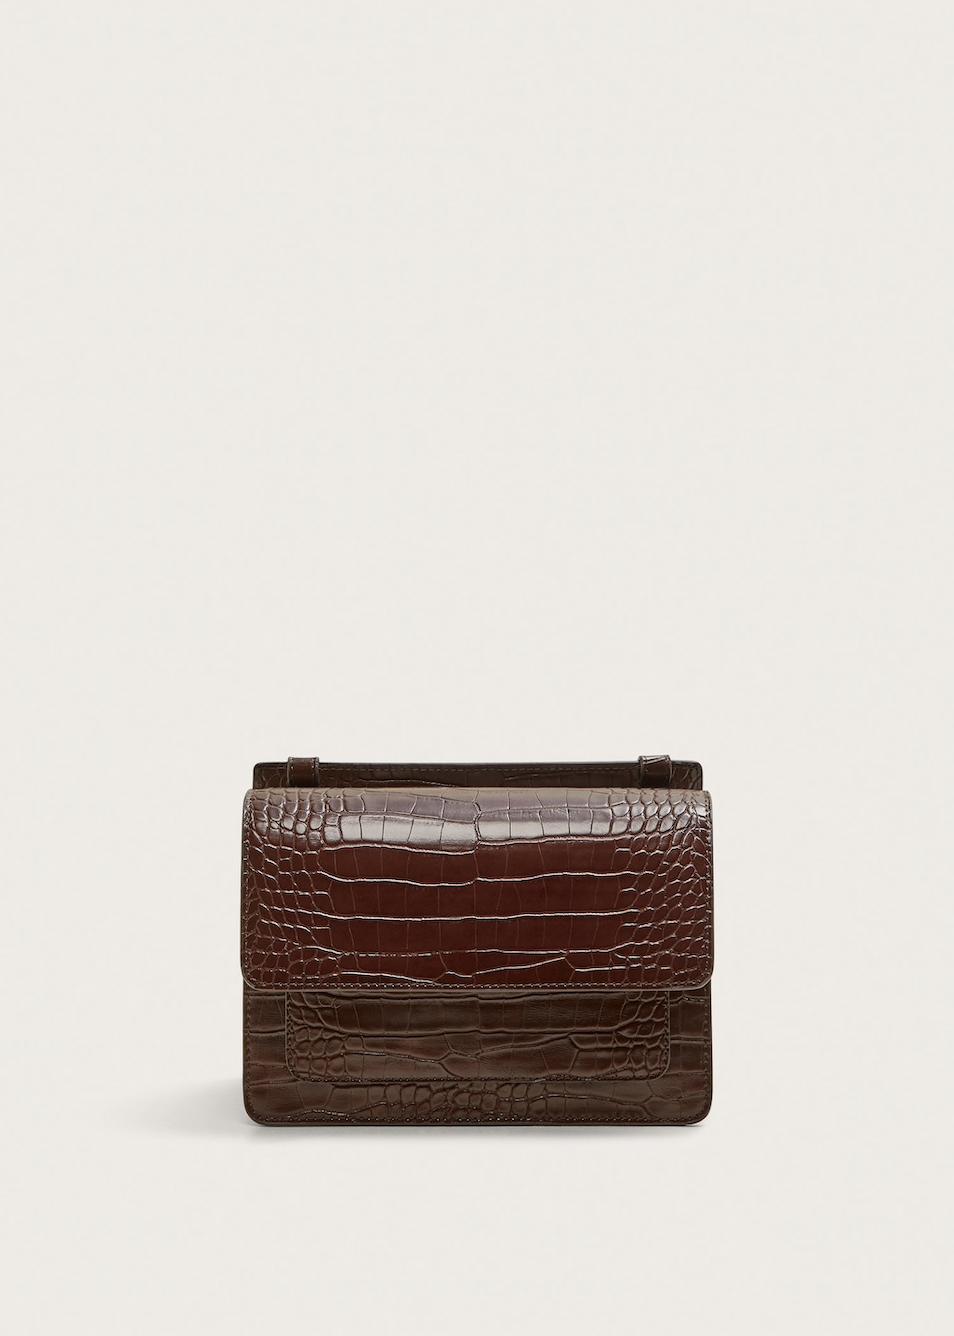 Violeta by MANGO bag, $97.56